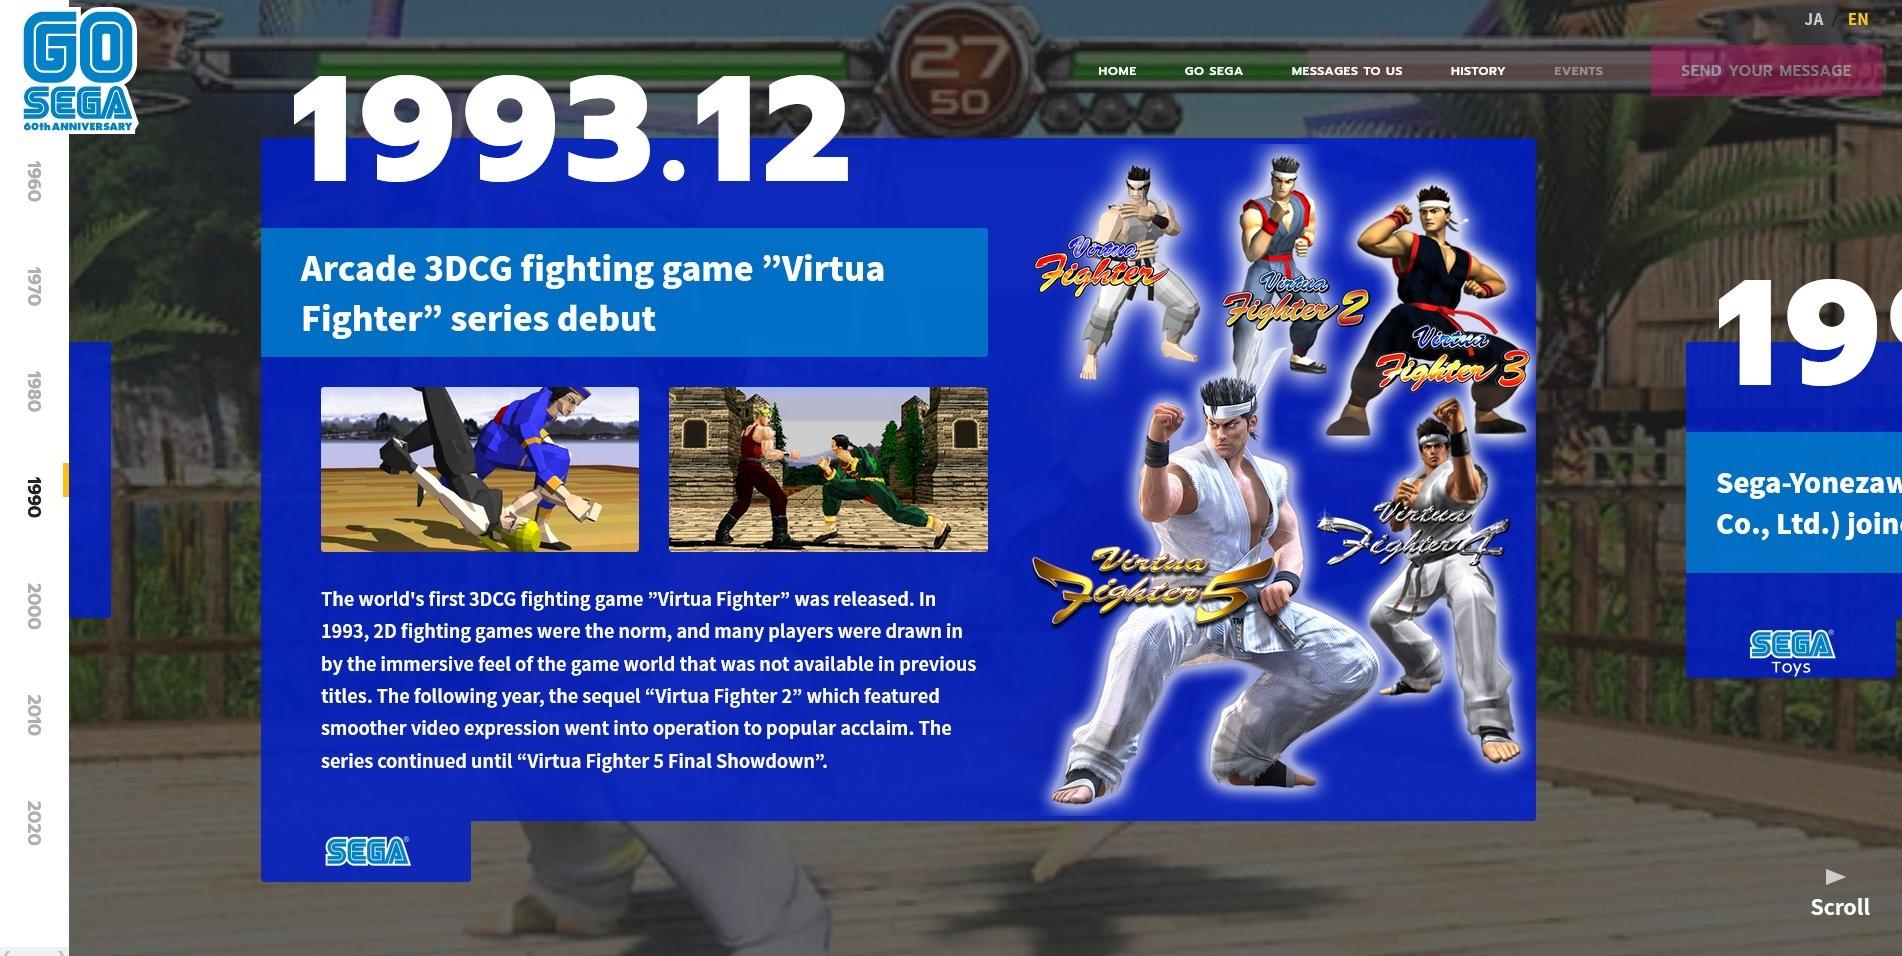 VF Sega 60 EN.jpg